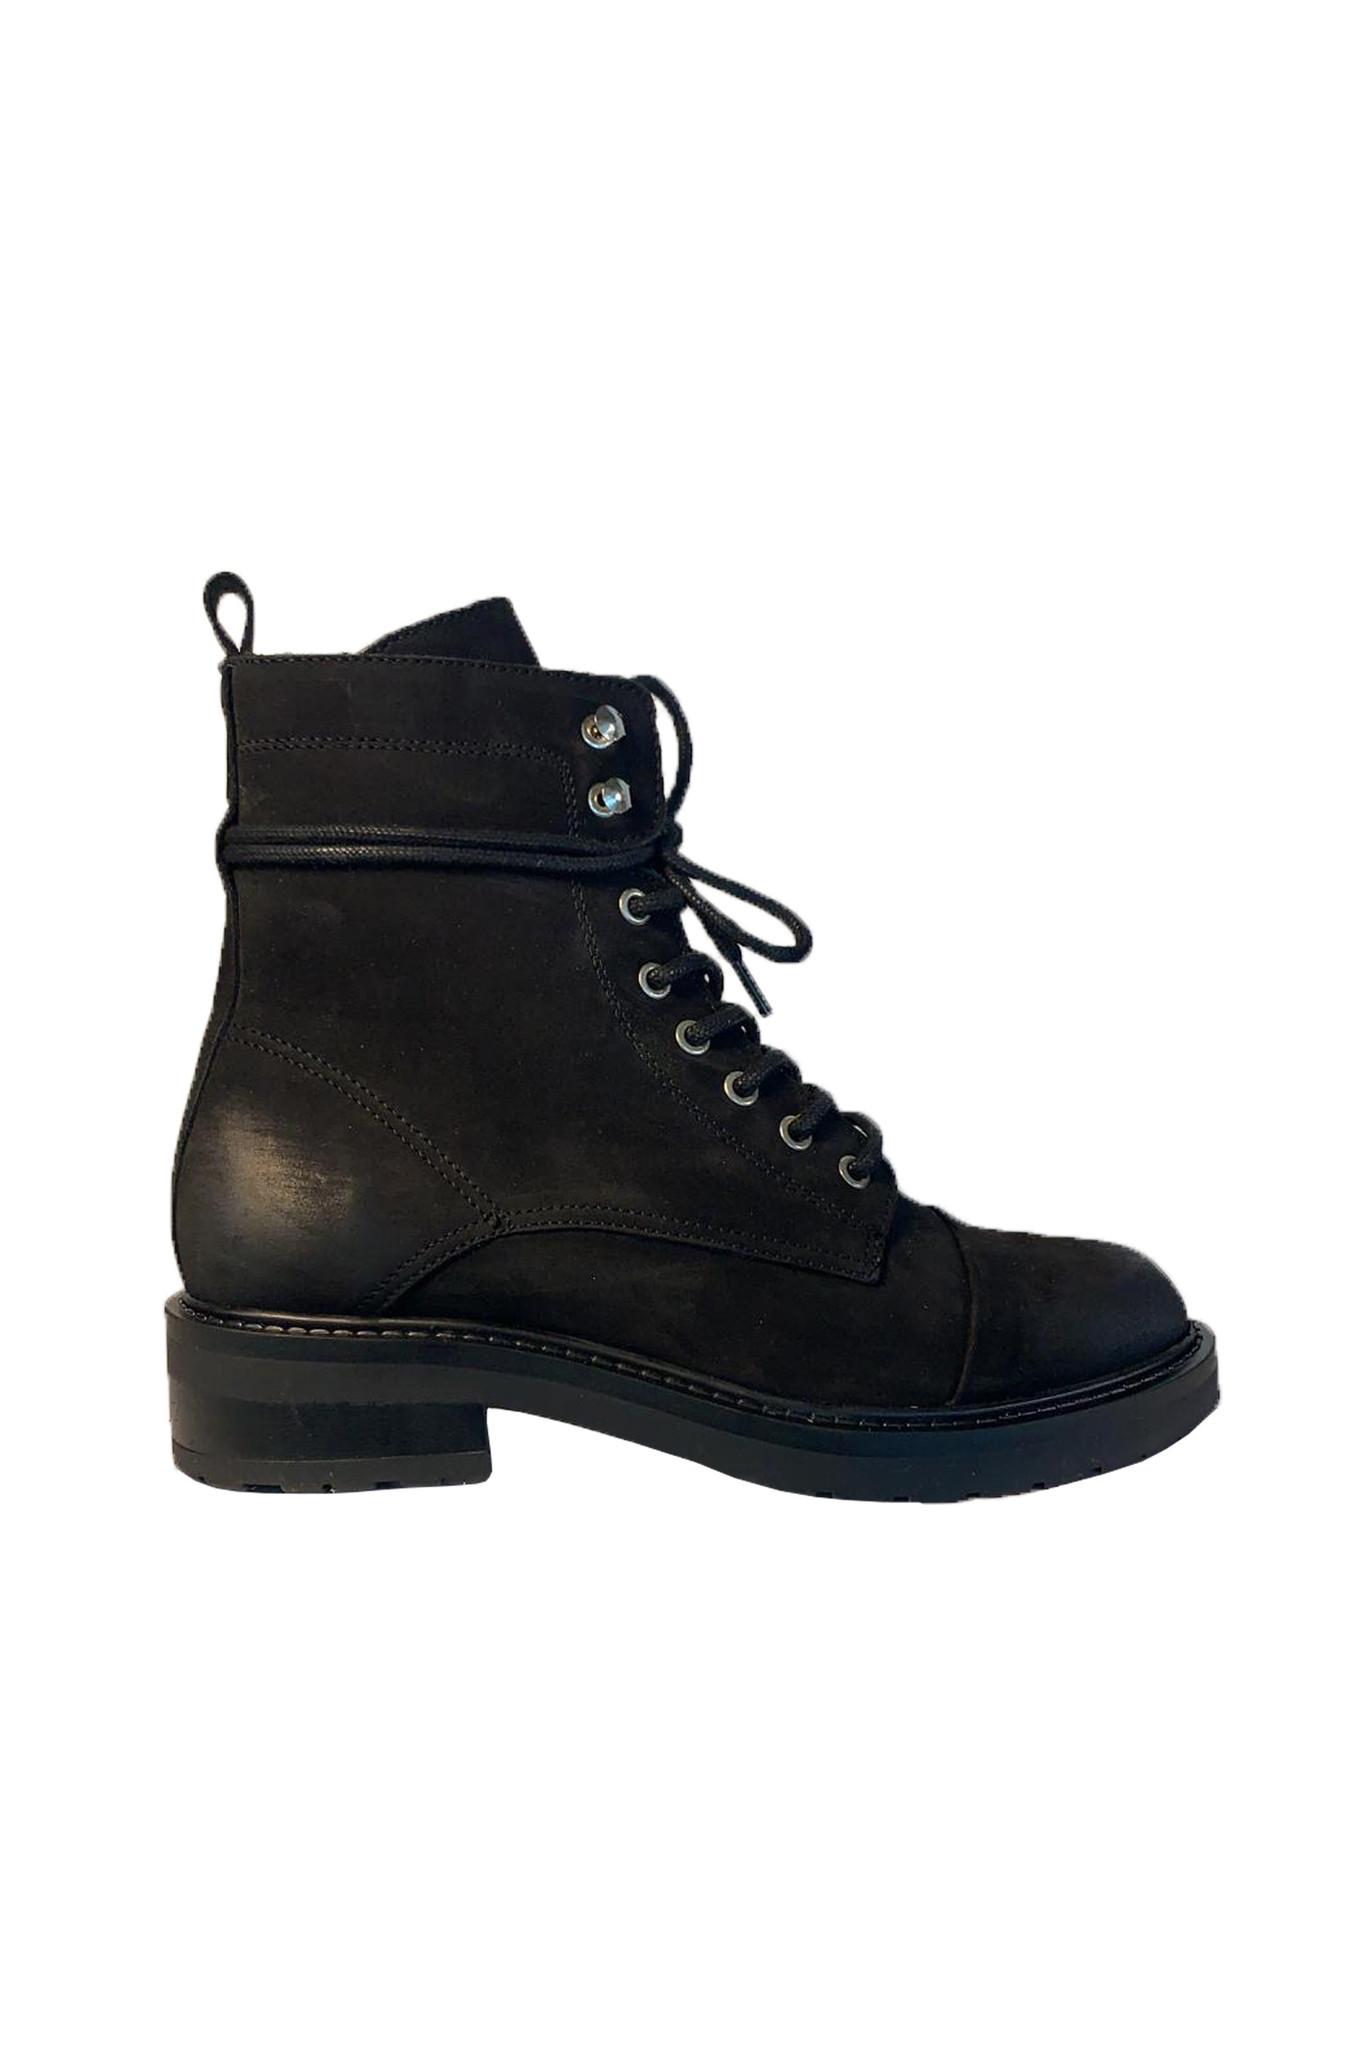 Charley Eco Boot - Black Nubuck-1